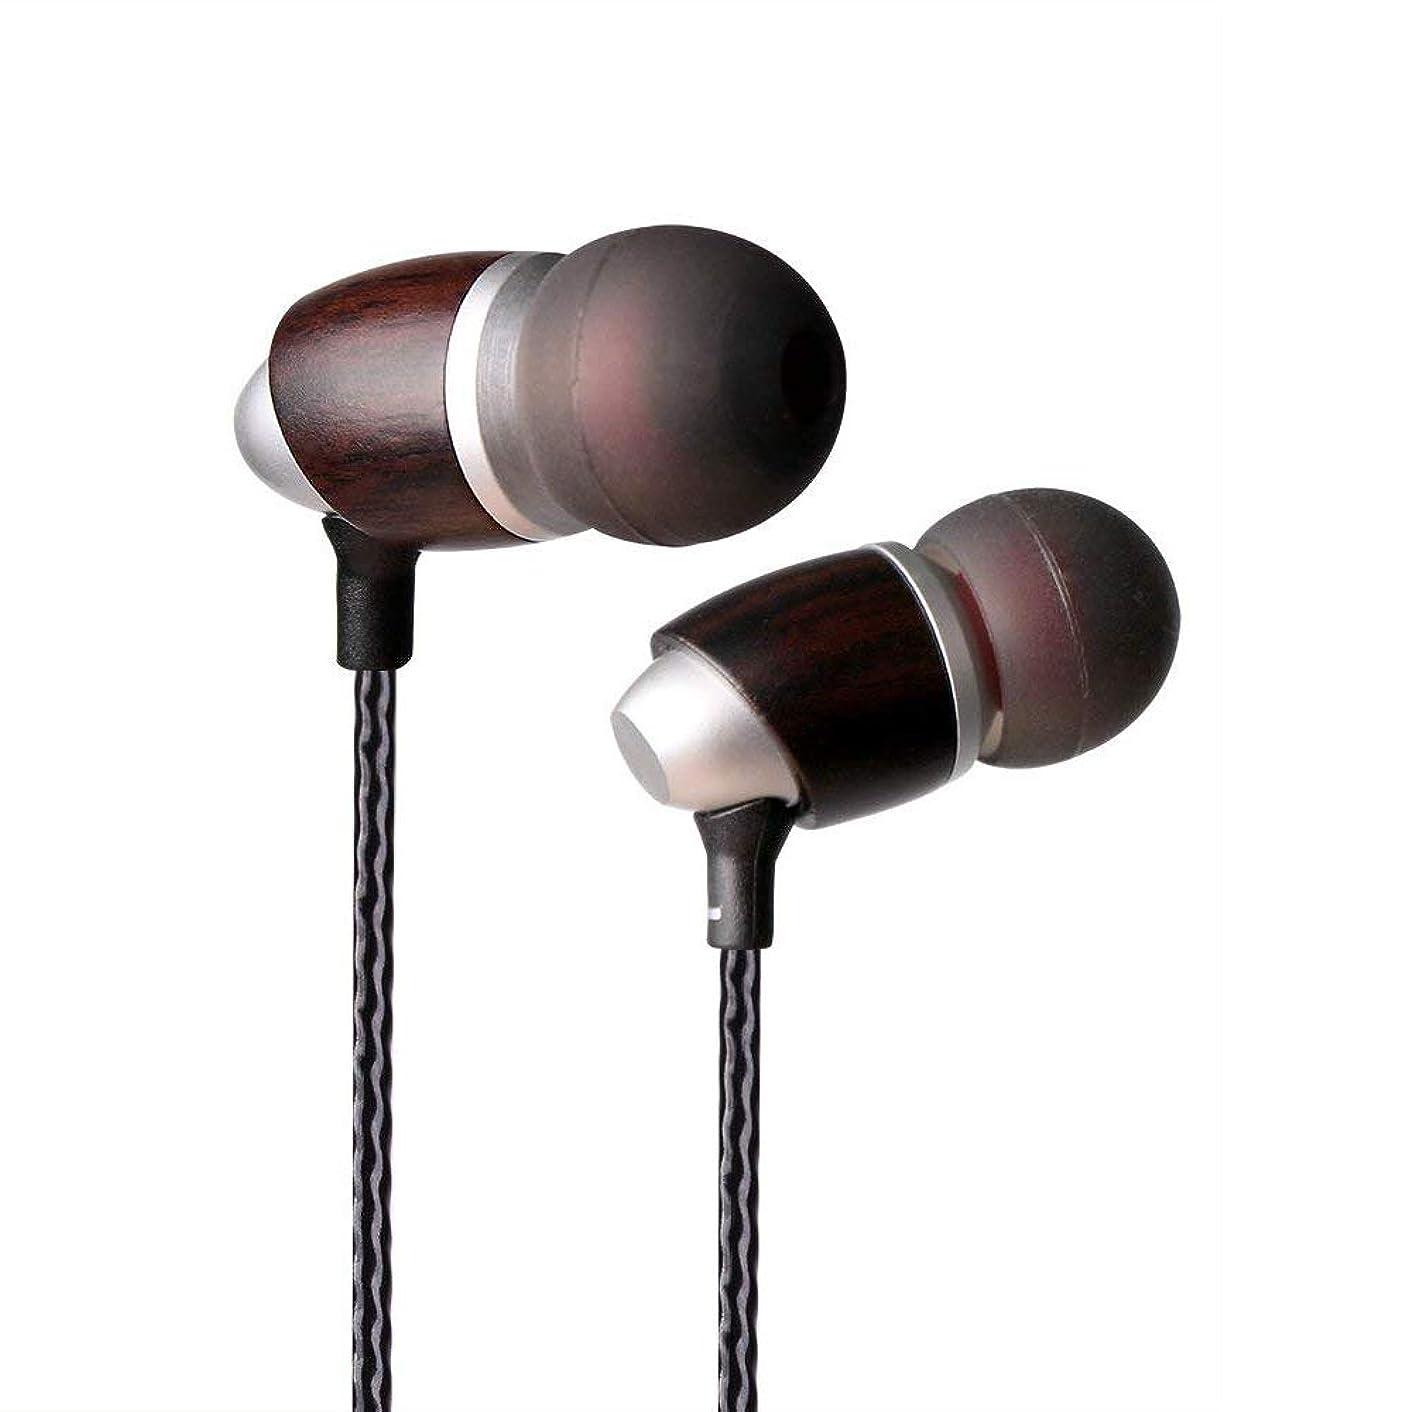 SIVGA M001 Portable Genuine Wood Lightweight Earphone Hi-Fi Stereo Noise Cancelling Tangle-Free Sport Earbud for Teen Adult (Ebony)